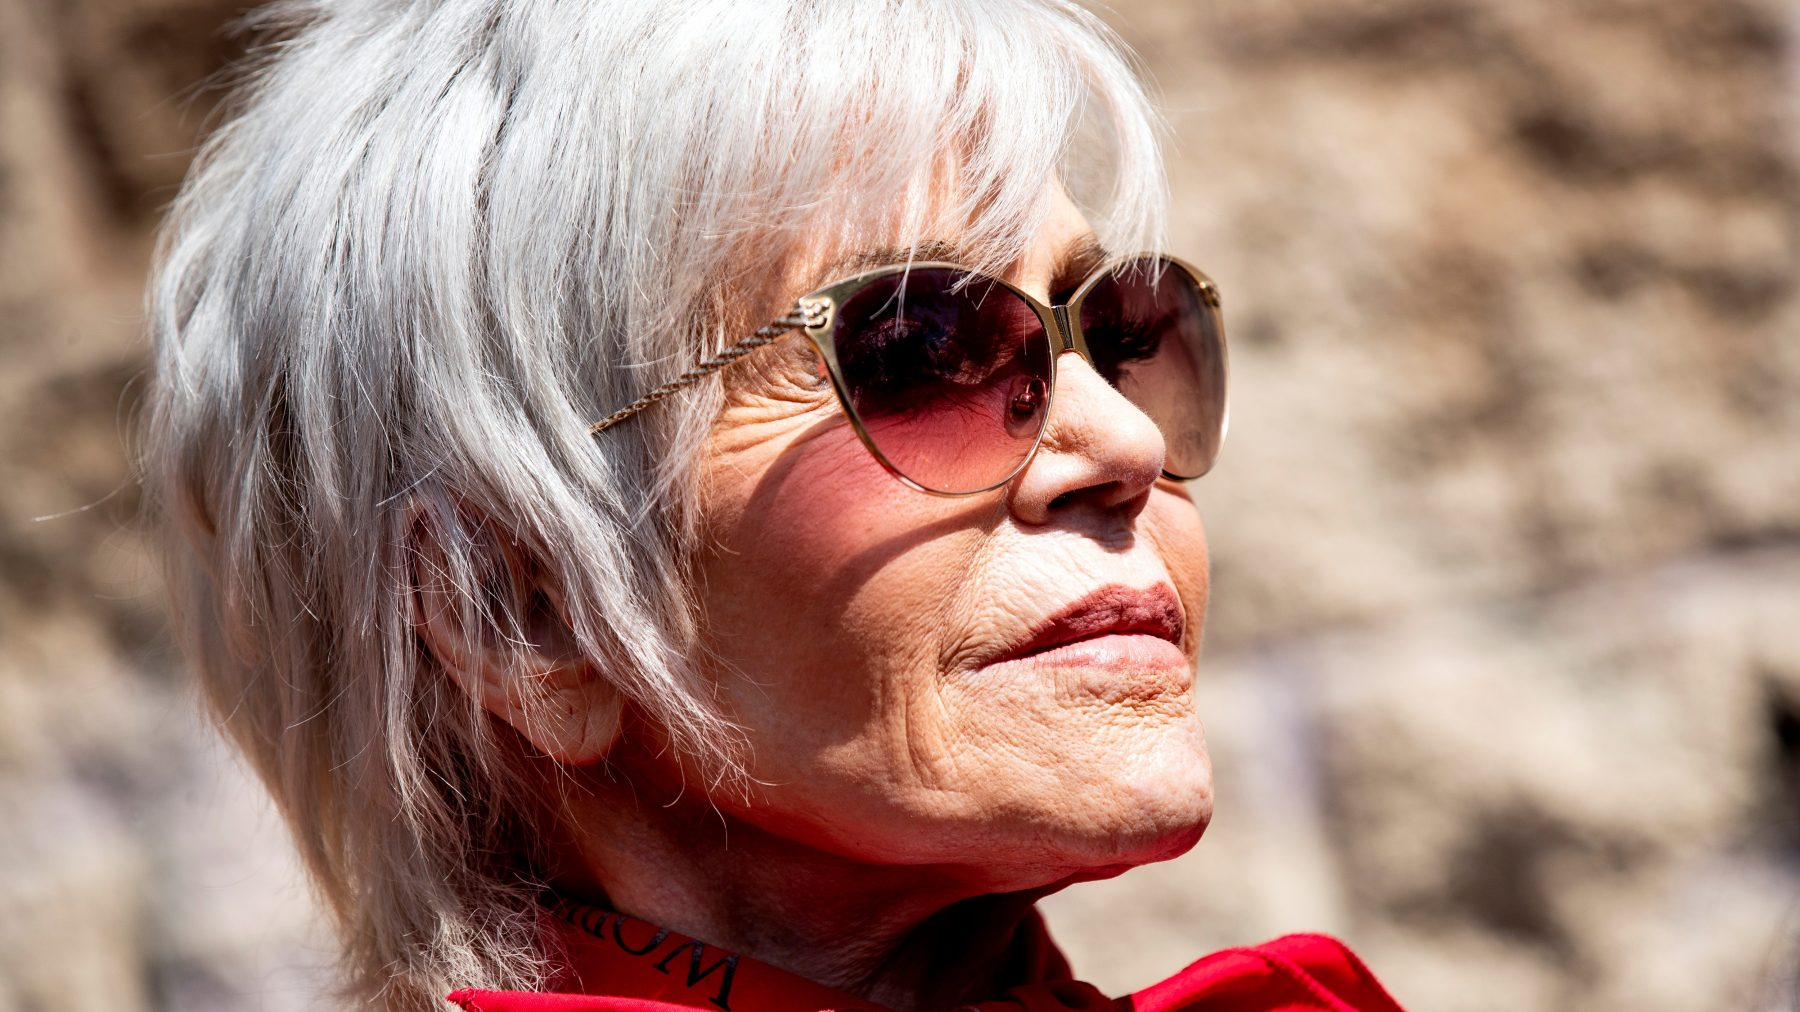 Jane Fonda online activist